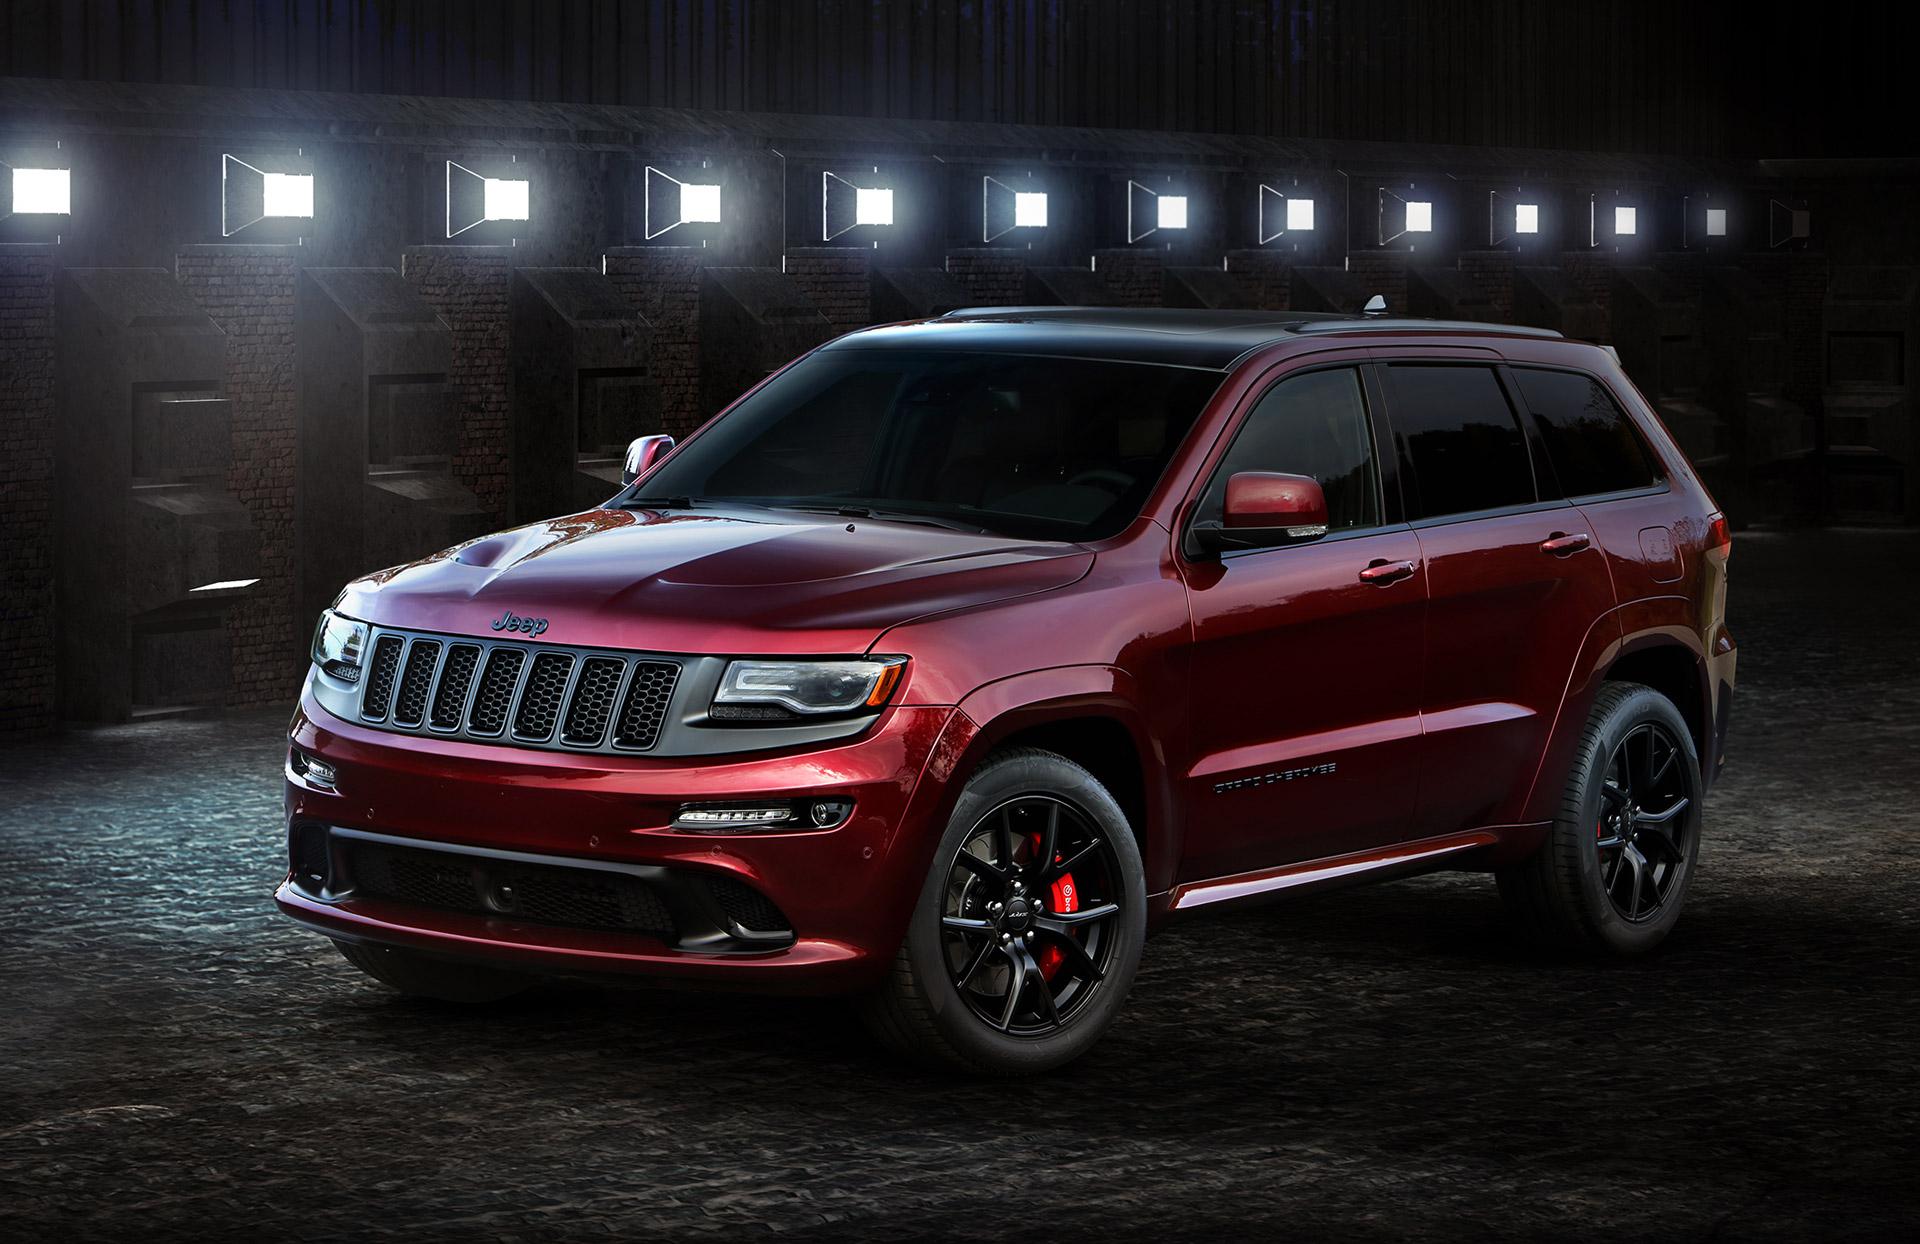 hight resolution of 2016 jeep grand cherokee srt